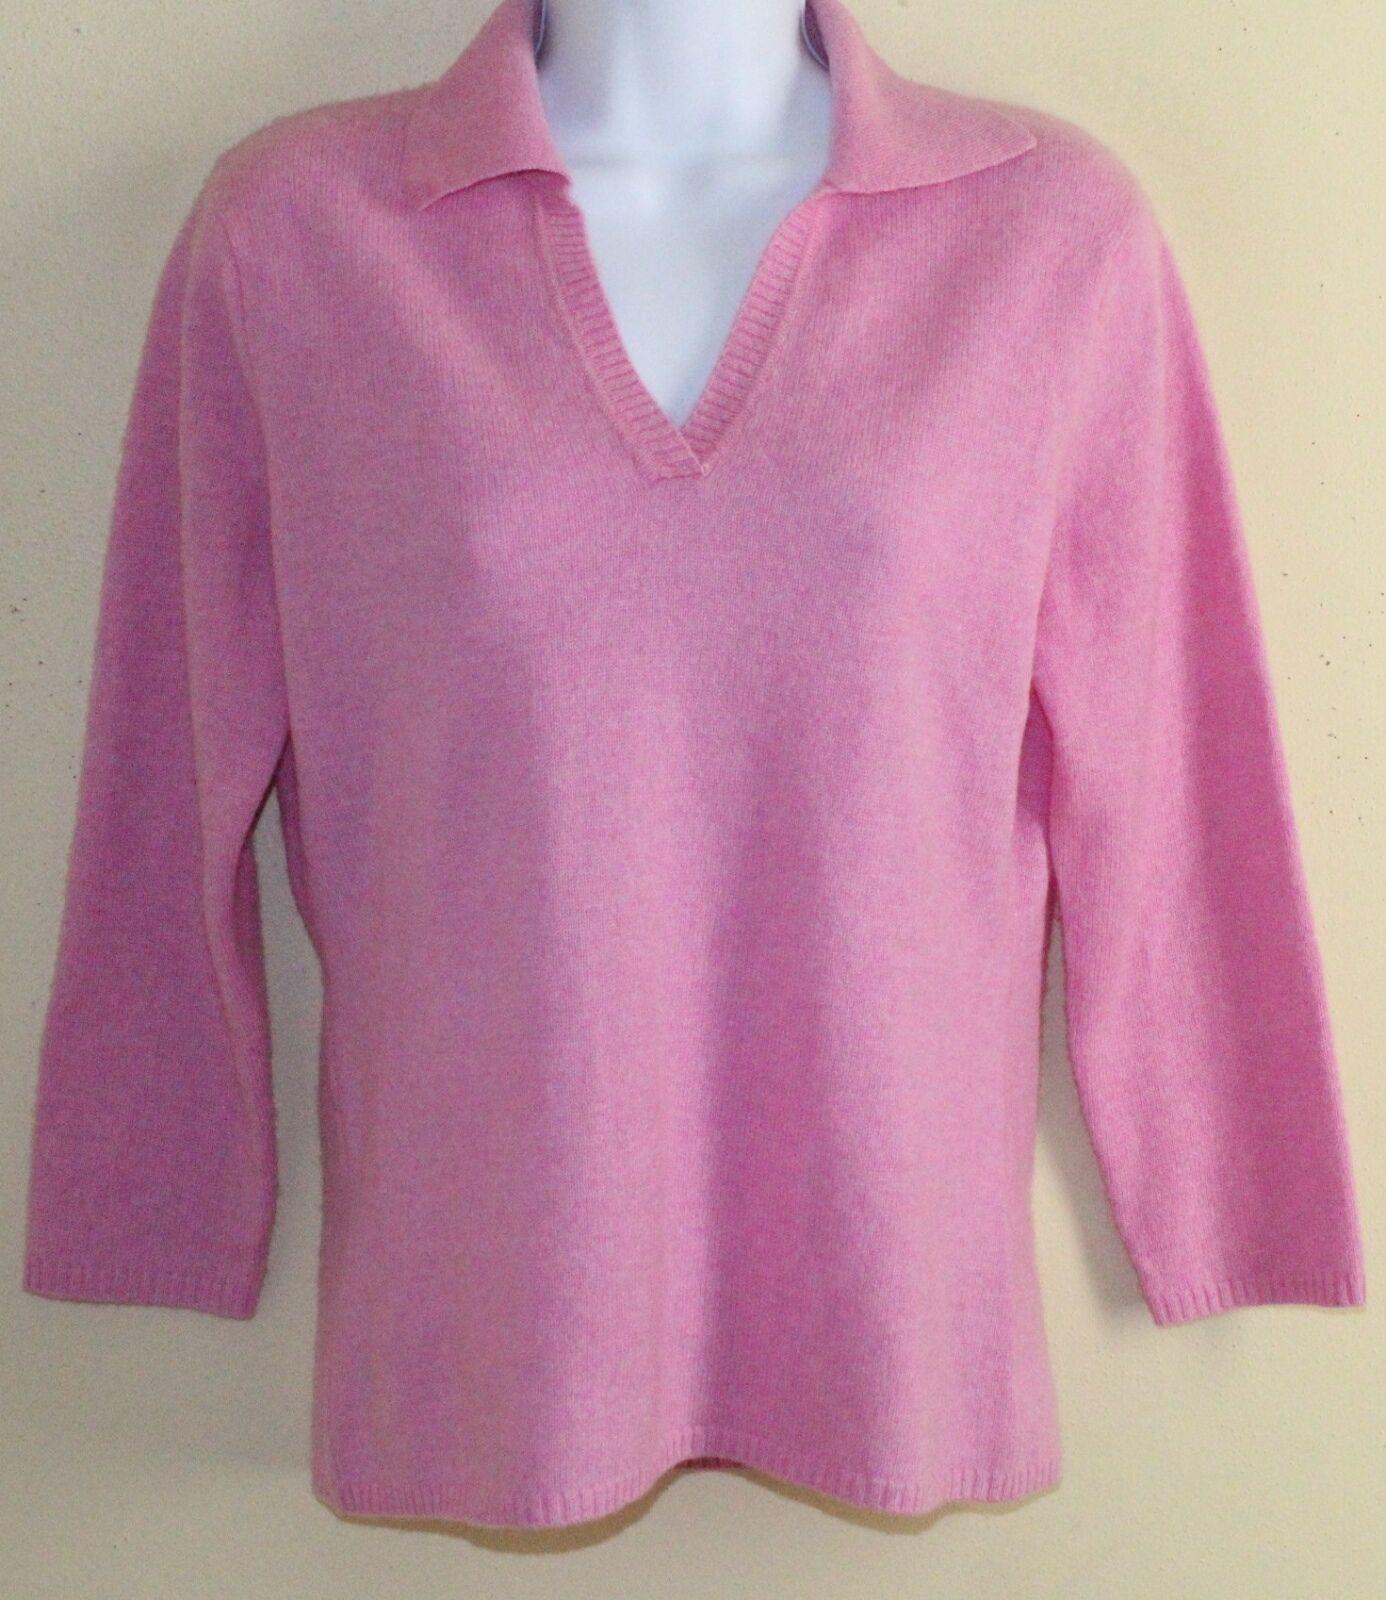 Geneva 100% Cashmere Softest Most Luxurious Pink 3 4 Sweater Sz M MINT